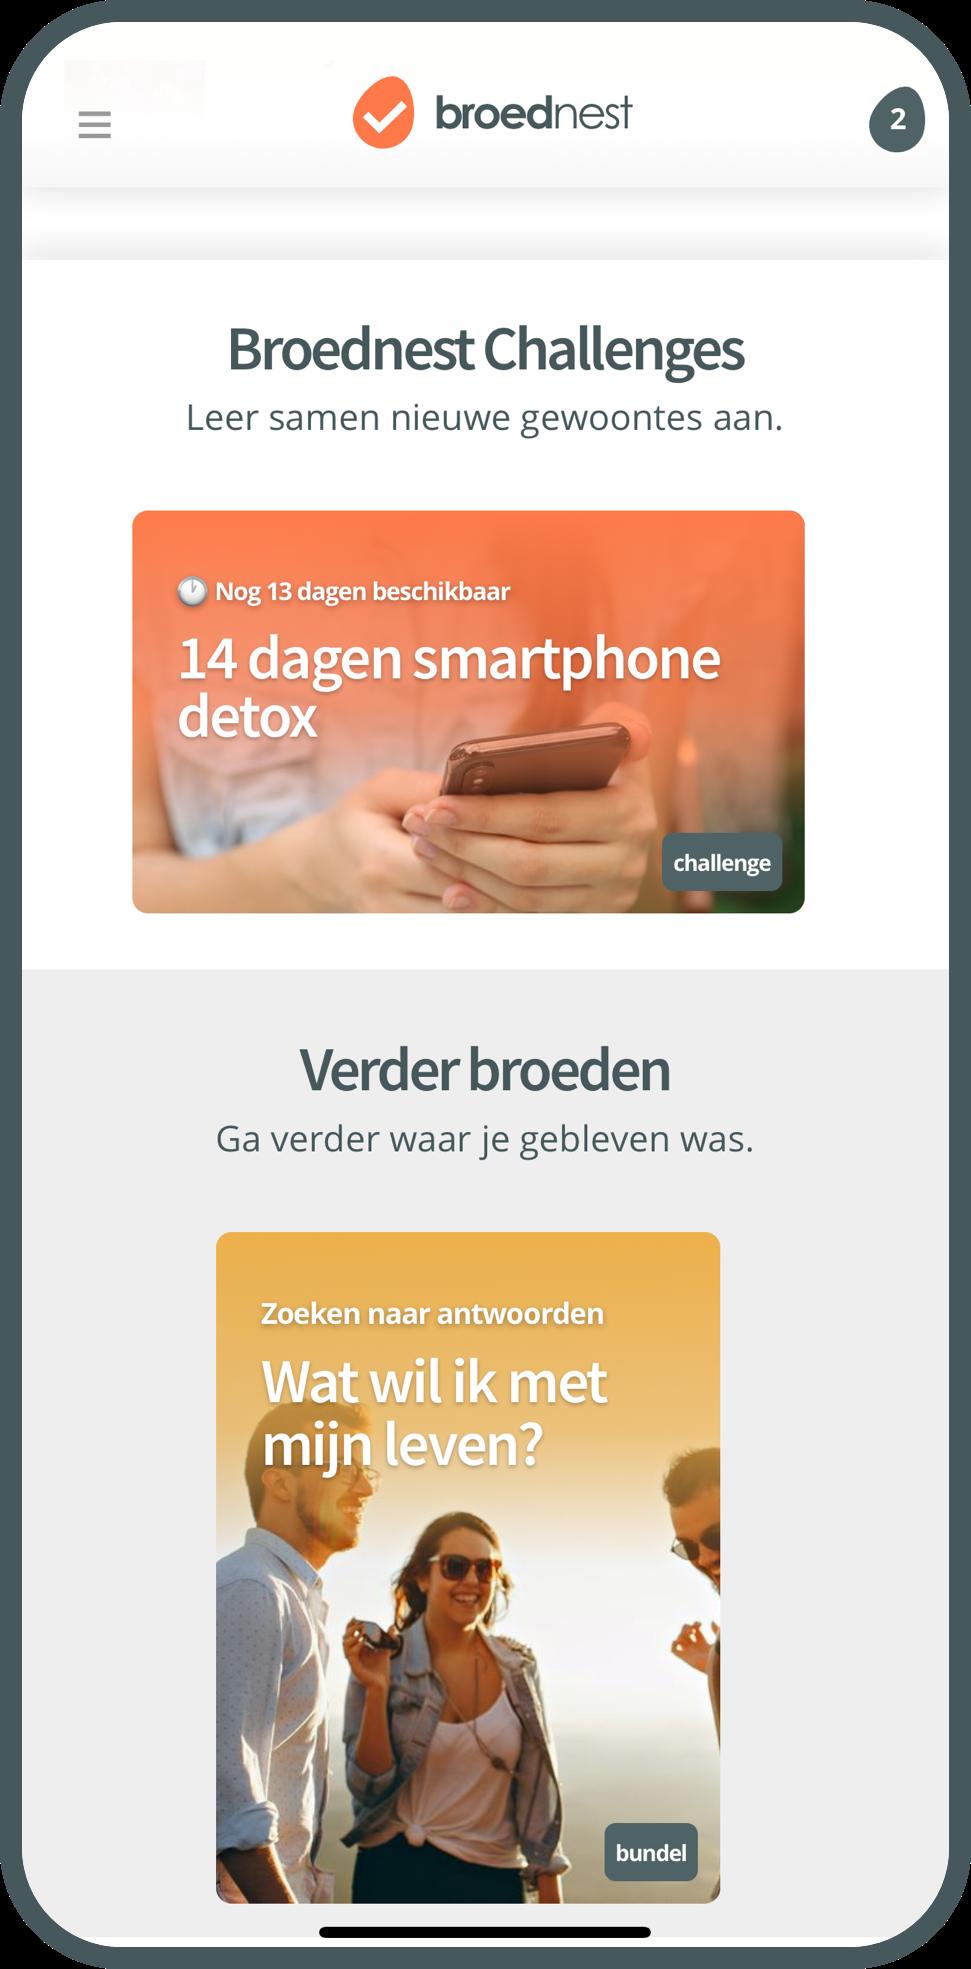 Broednest app preview